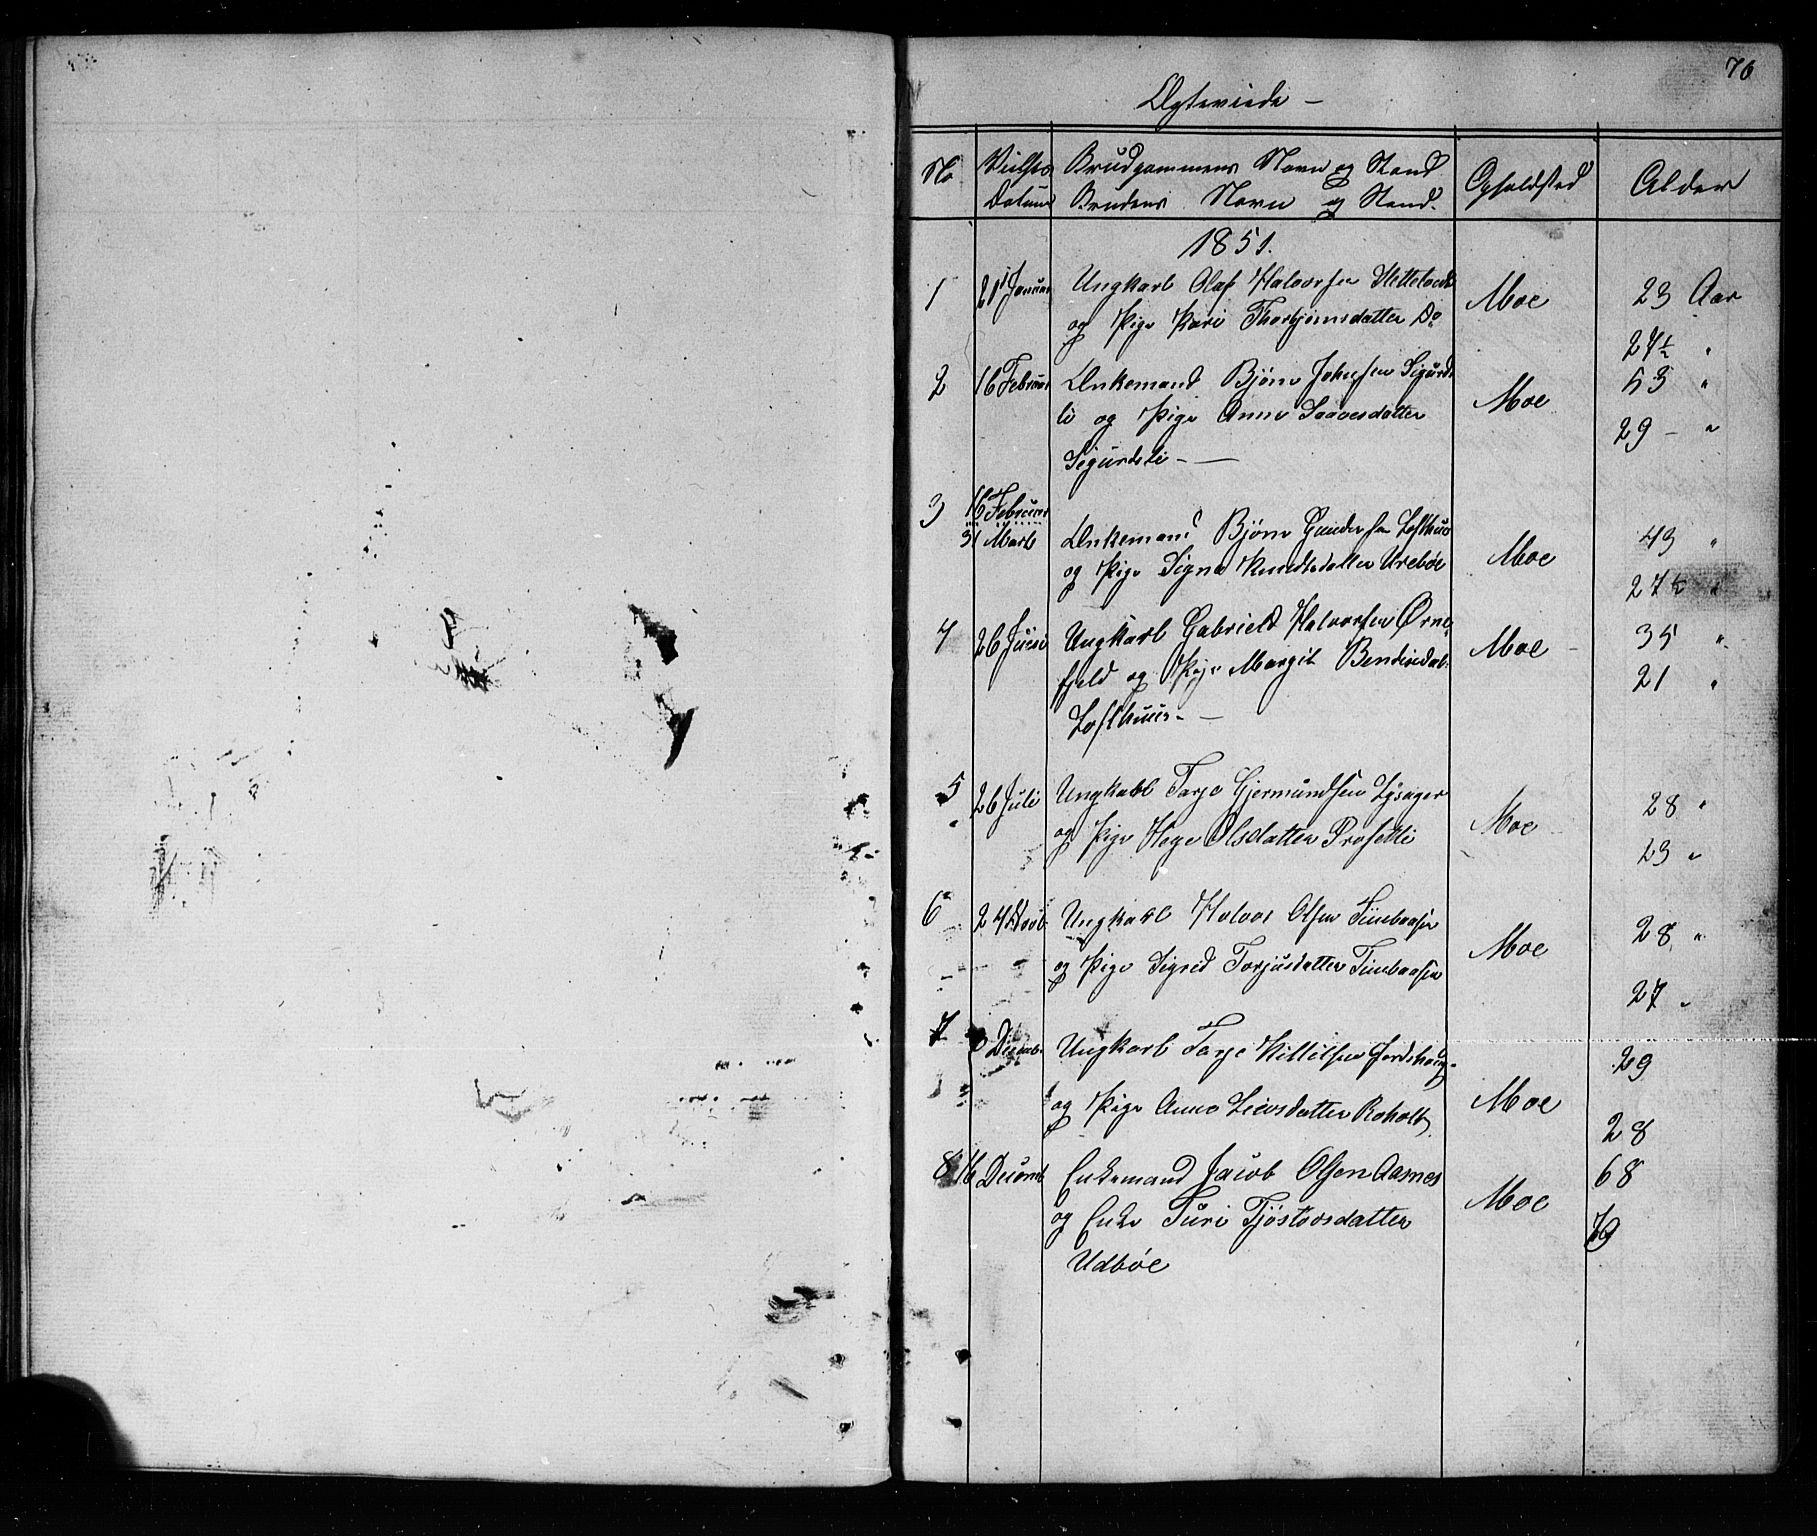 SAKO, Mo kirkebøker, G/Ga/L0001: Klokkerbok nr. I 1, 1851-1891, s. 76